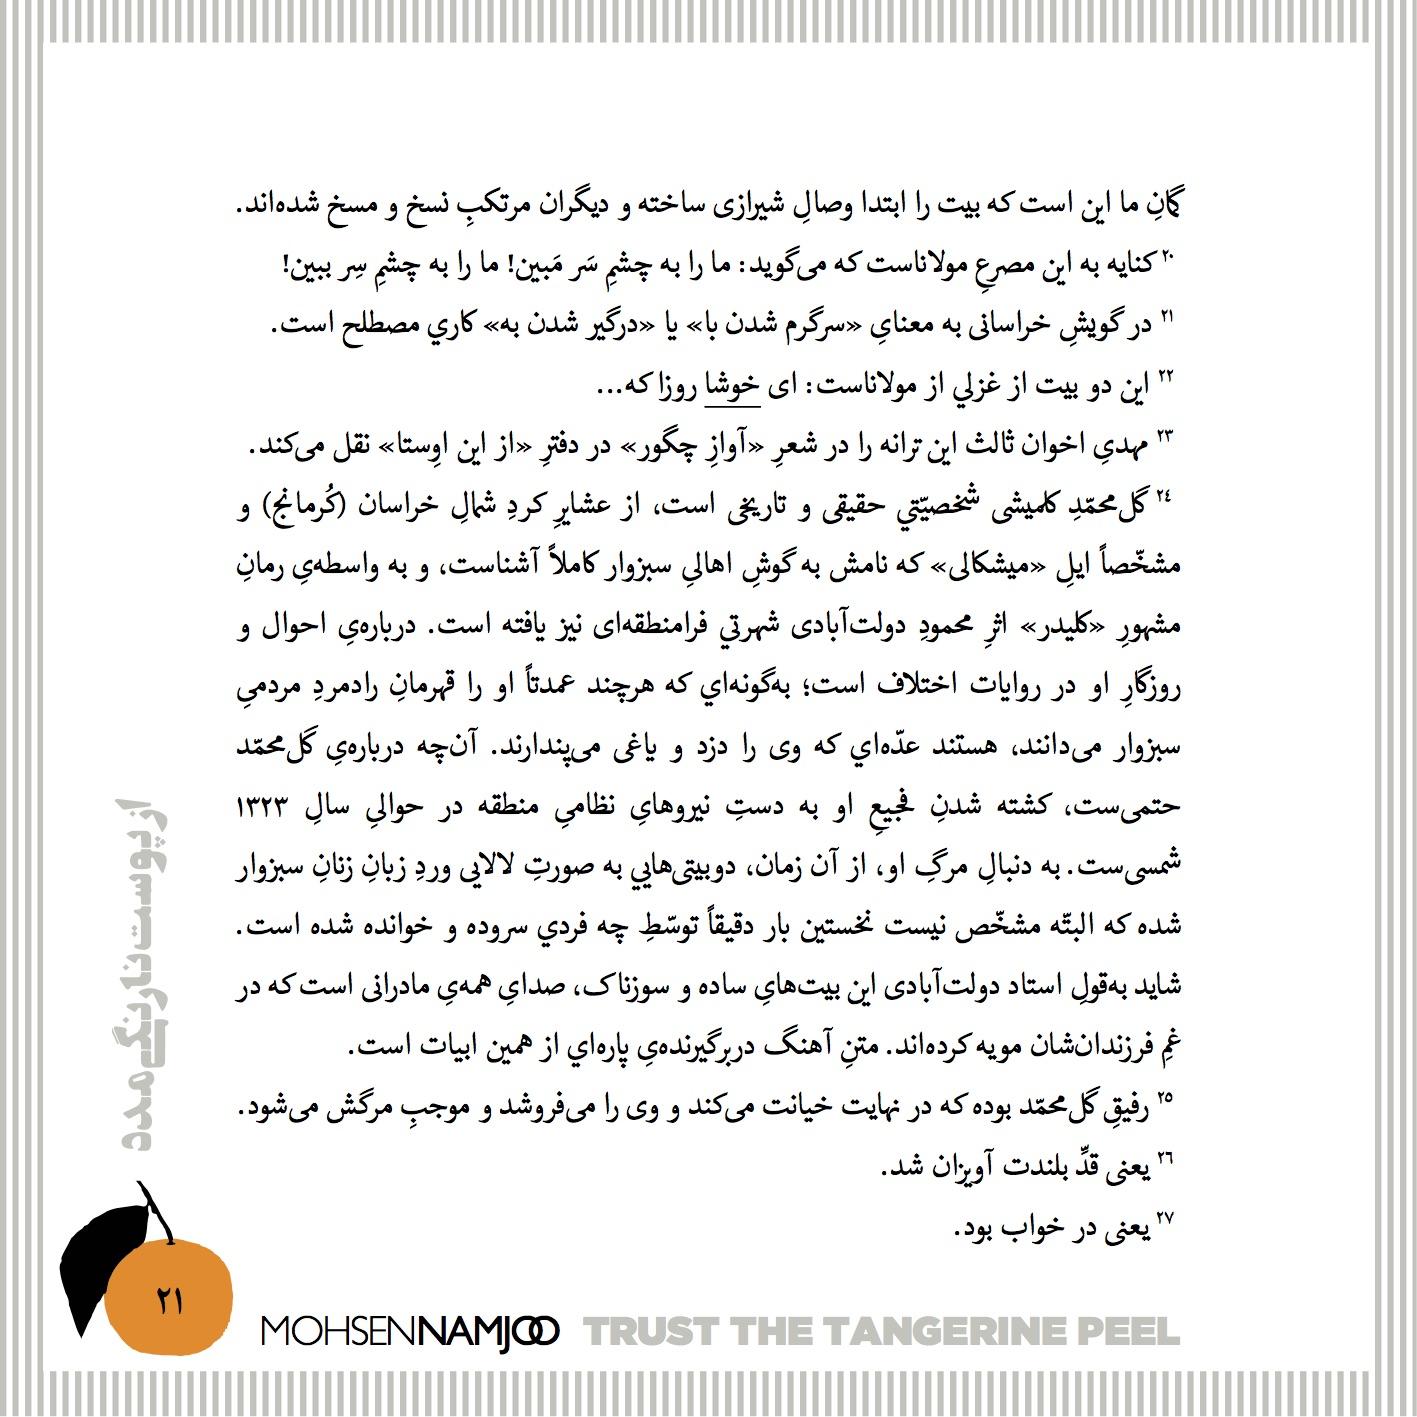 22-Trust the Tangerine Peel Final.jpg